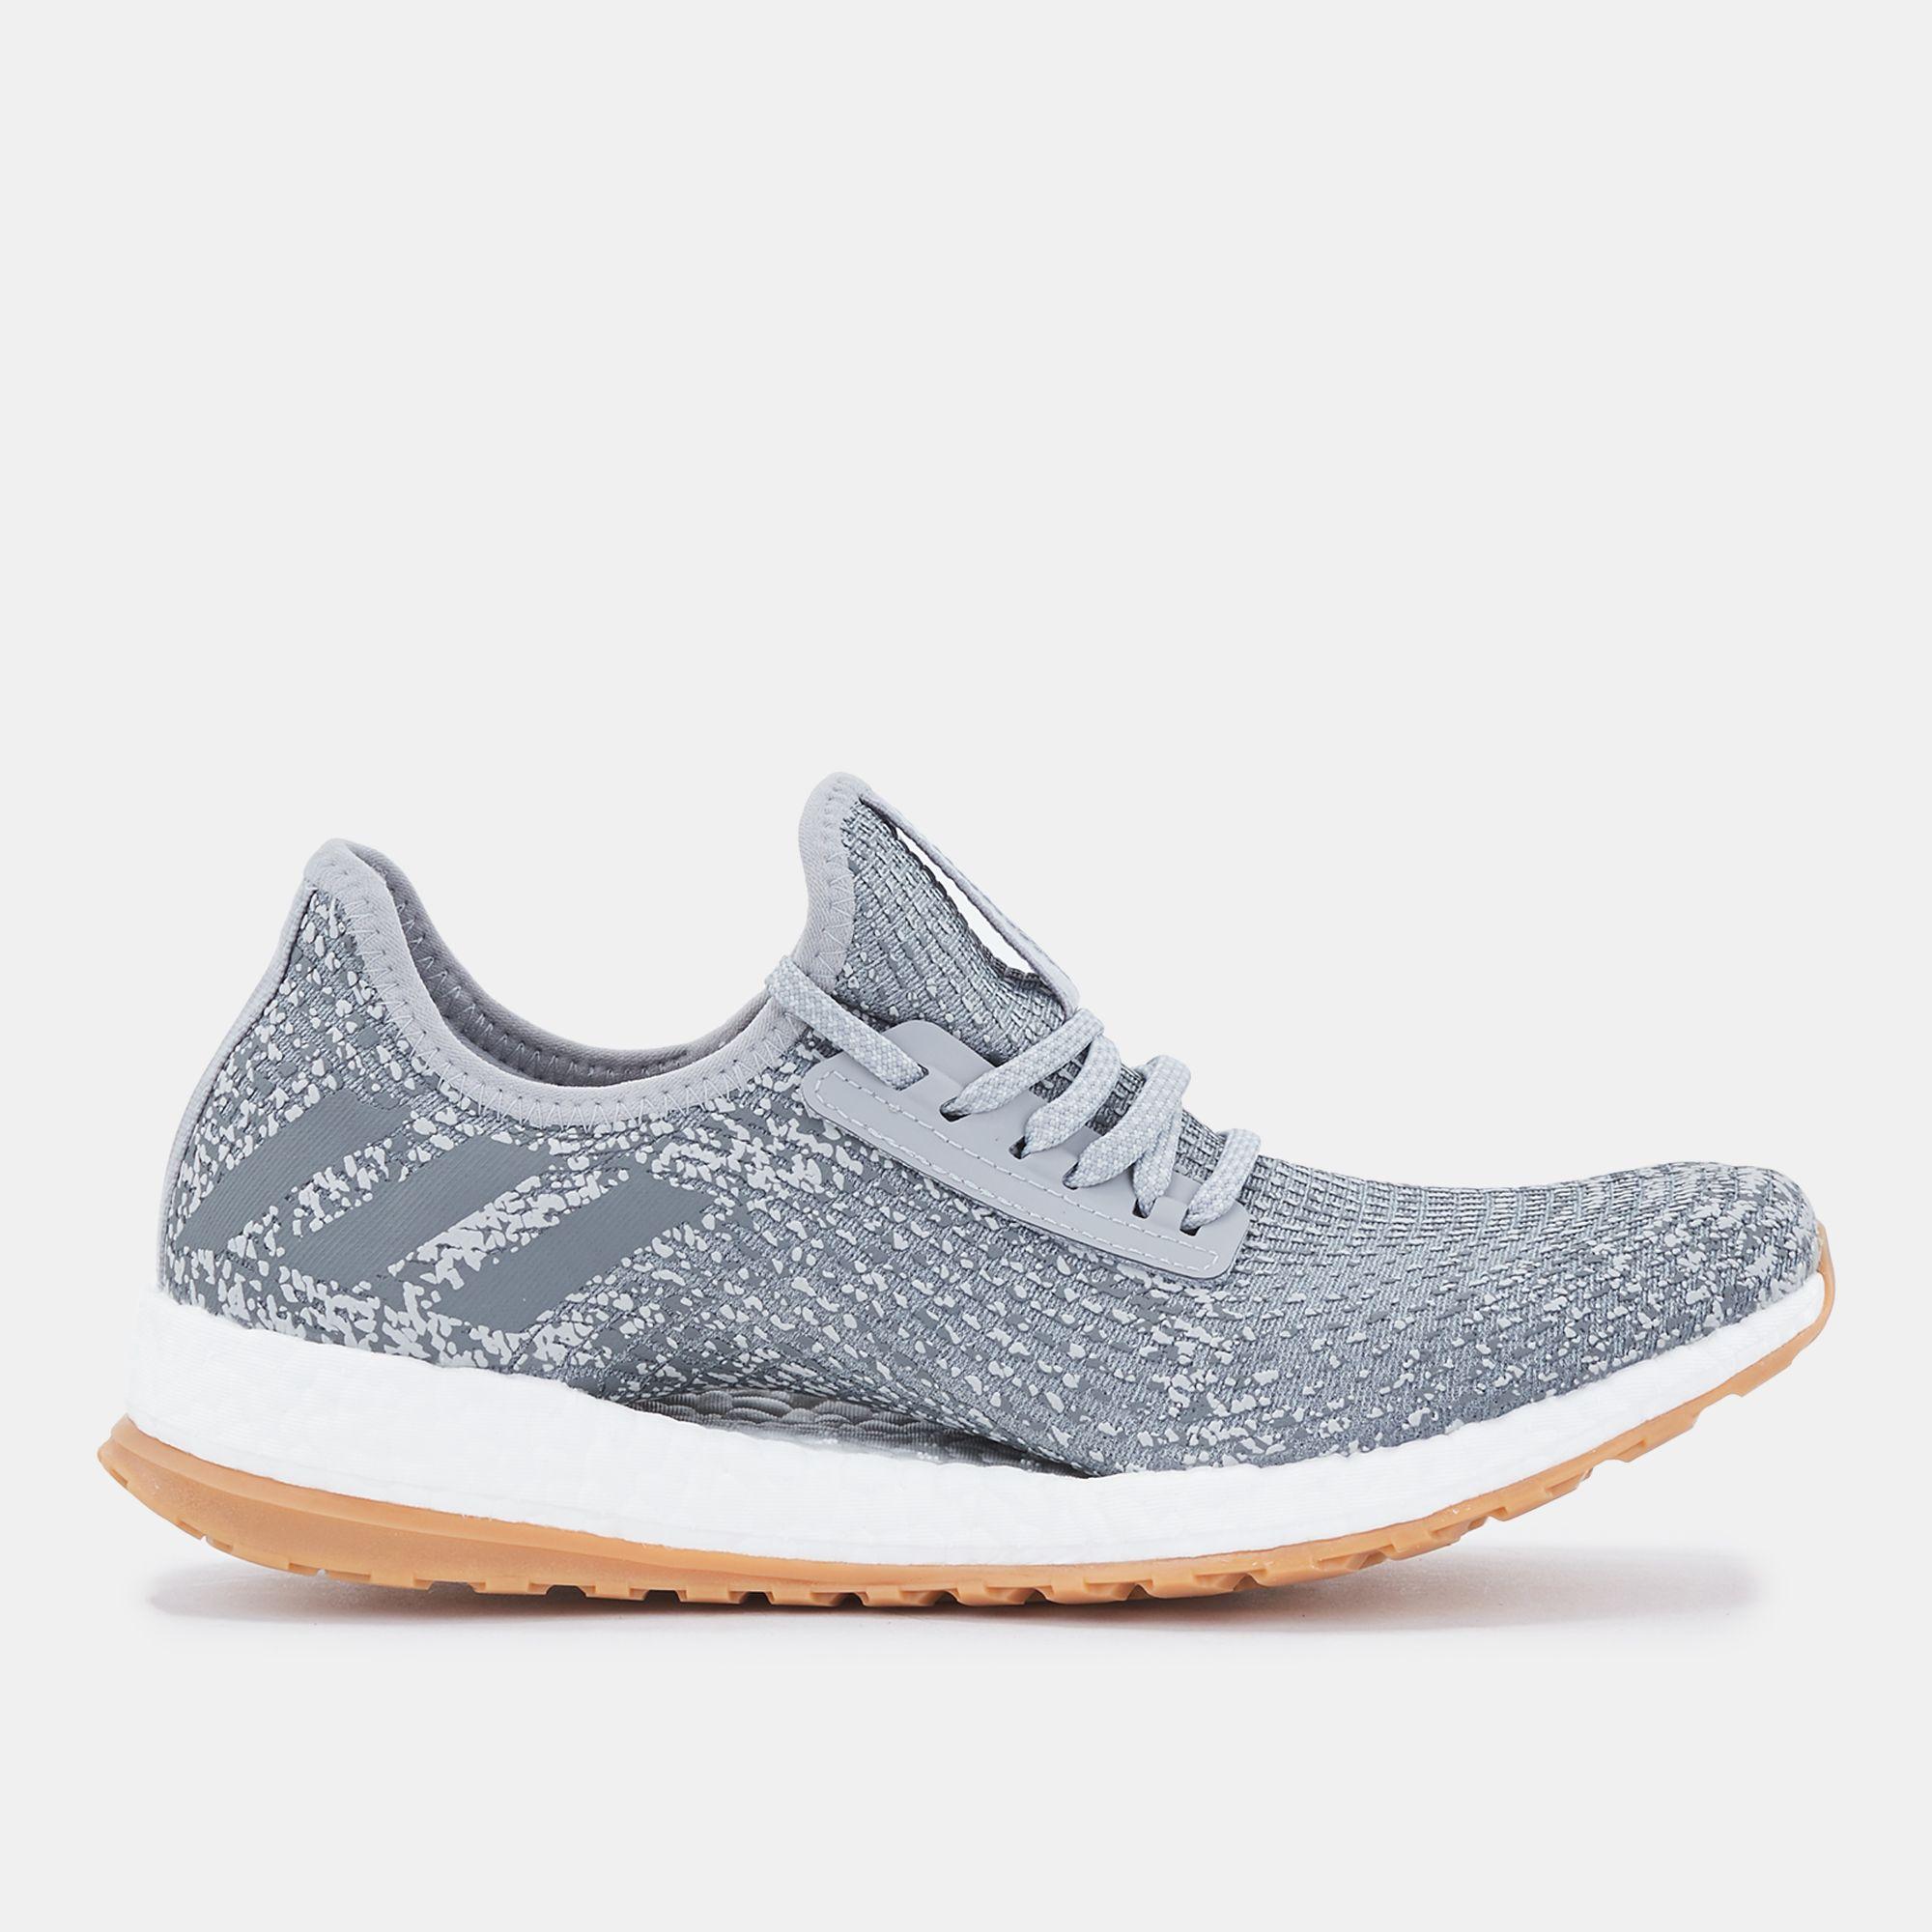 adidas pureboost x% scarpa correndo le scarpe